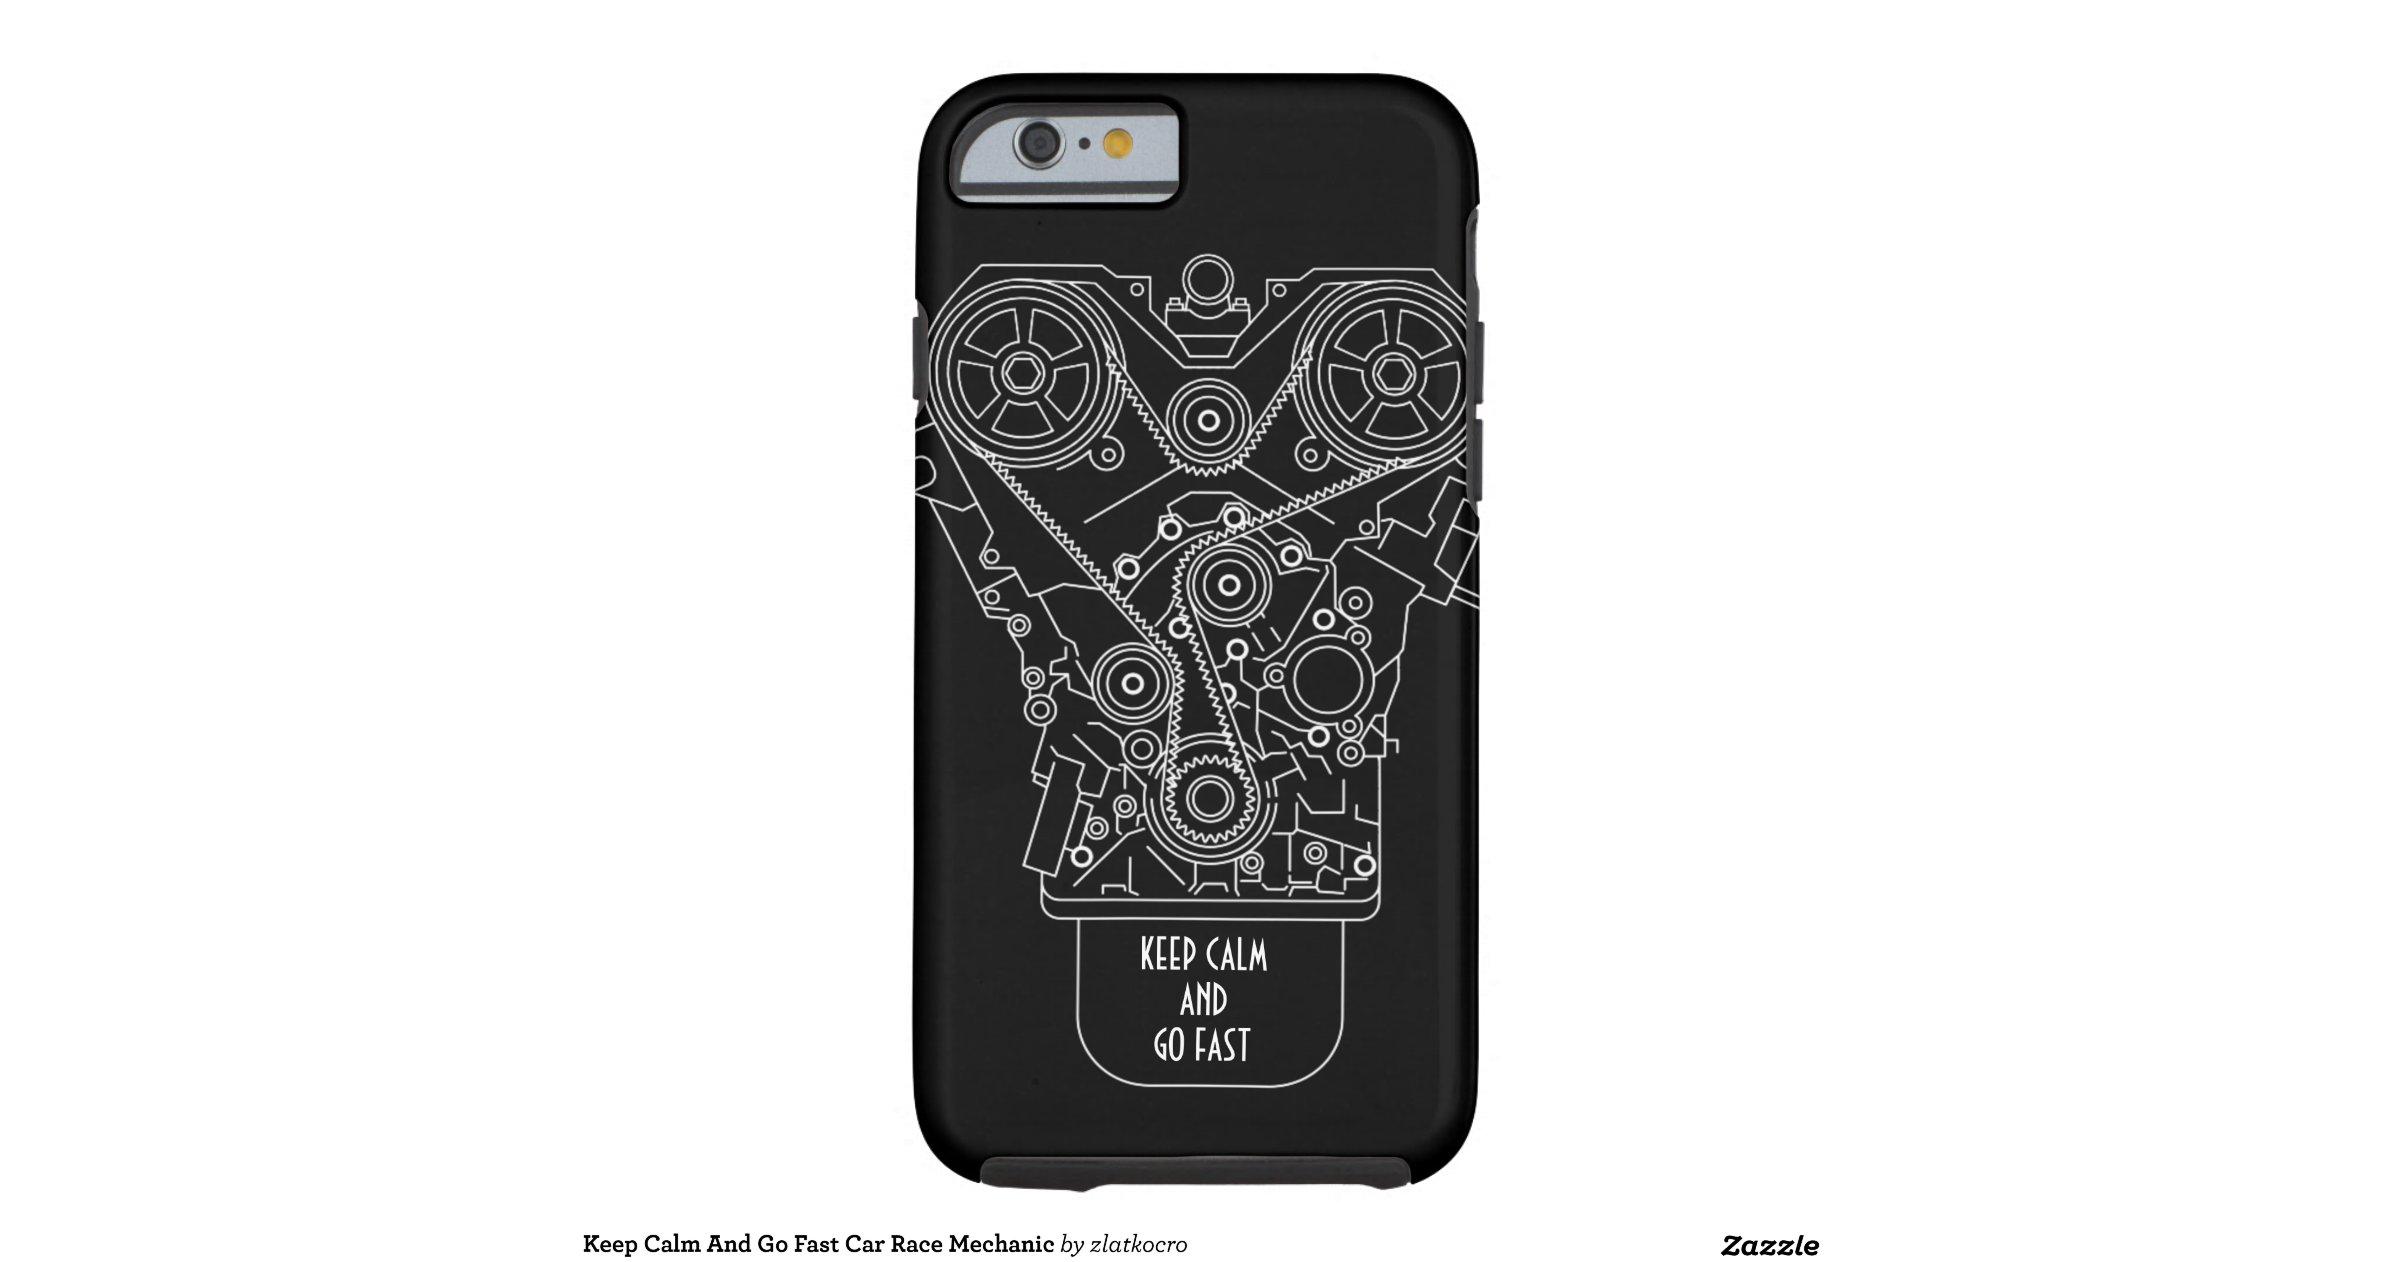 keep calm and go fast car race mechanic tough iphone 6 case zazzle. Black Bedroom Furniture Sets. Home Design Ideas